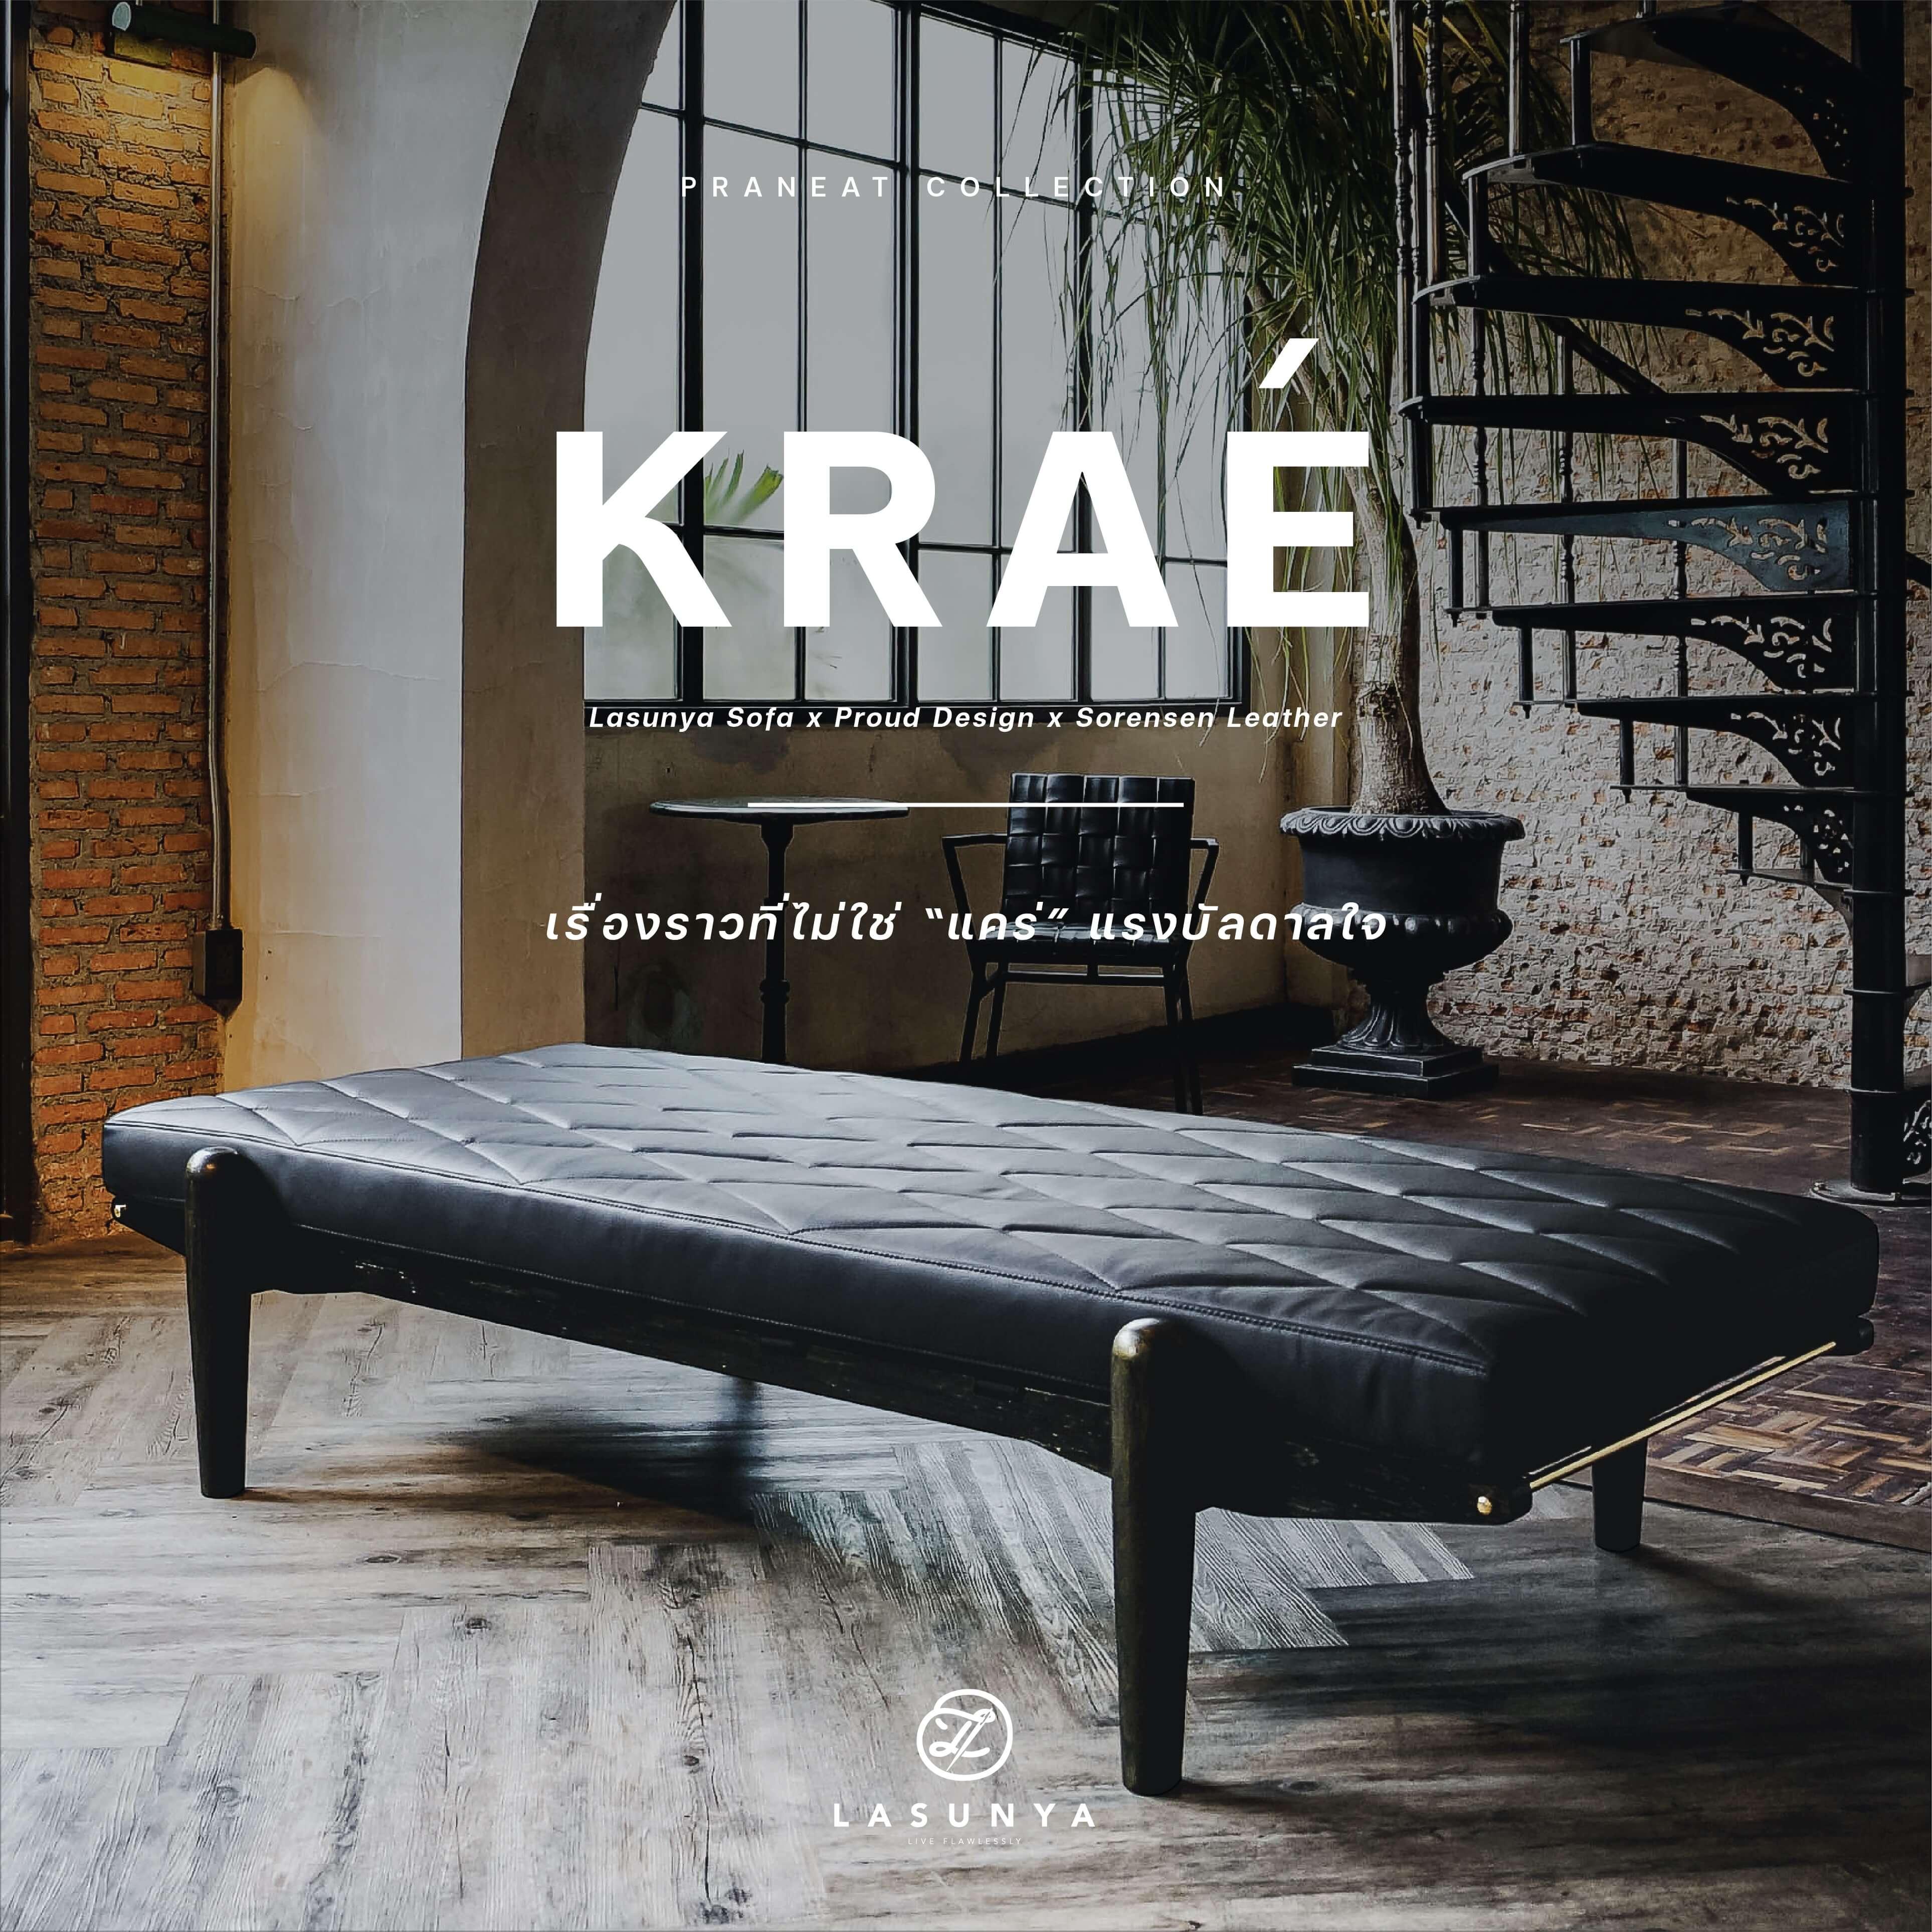 krae leather bench lasunya